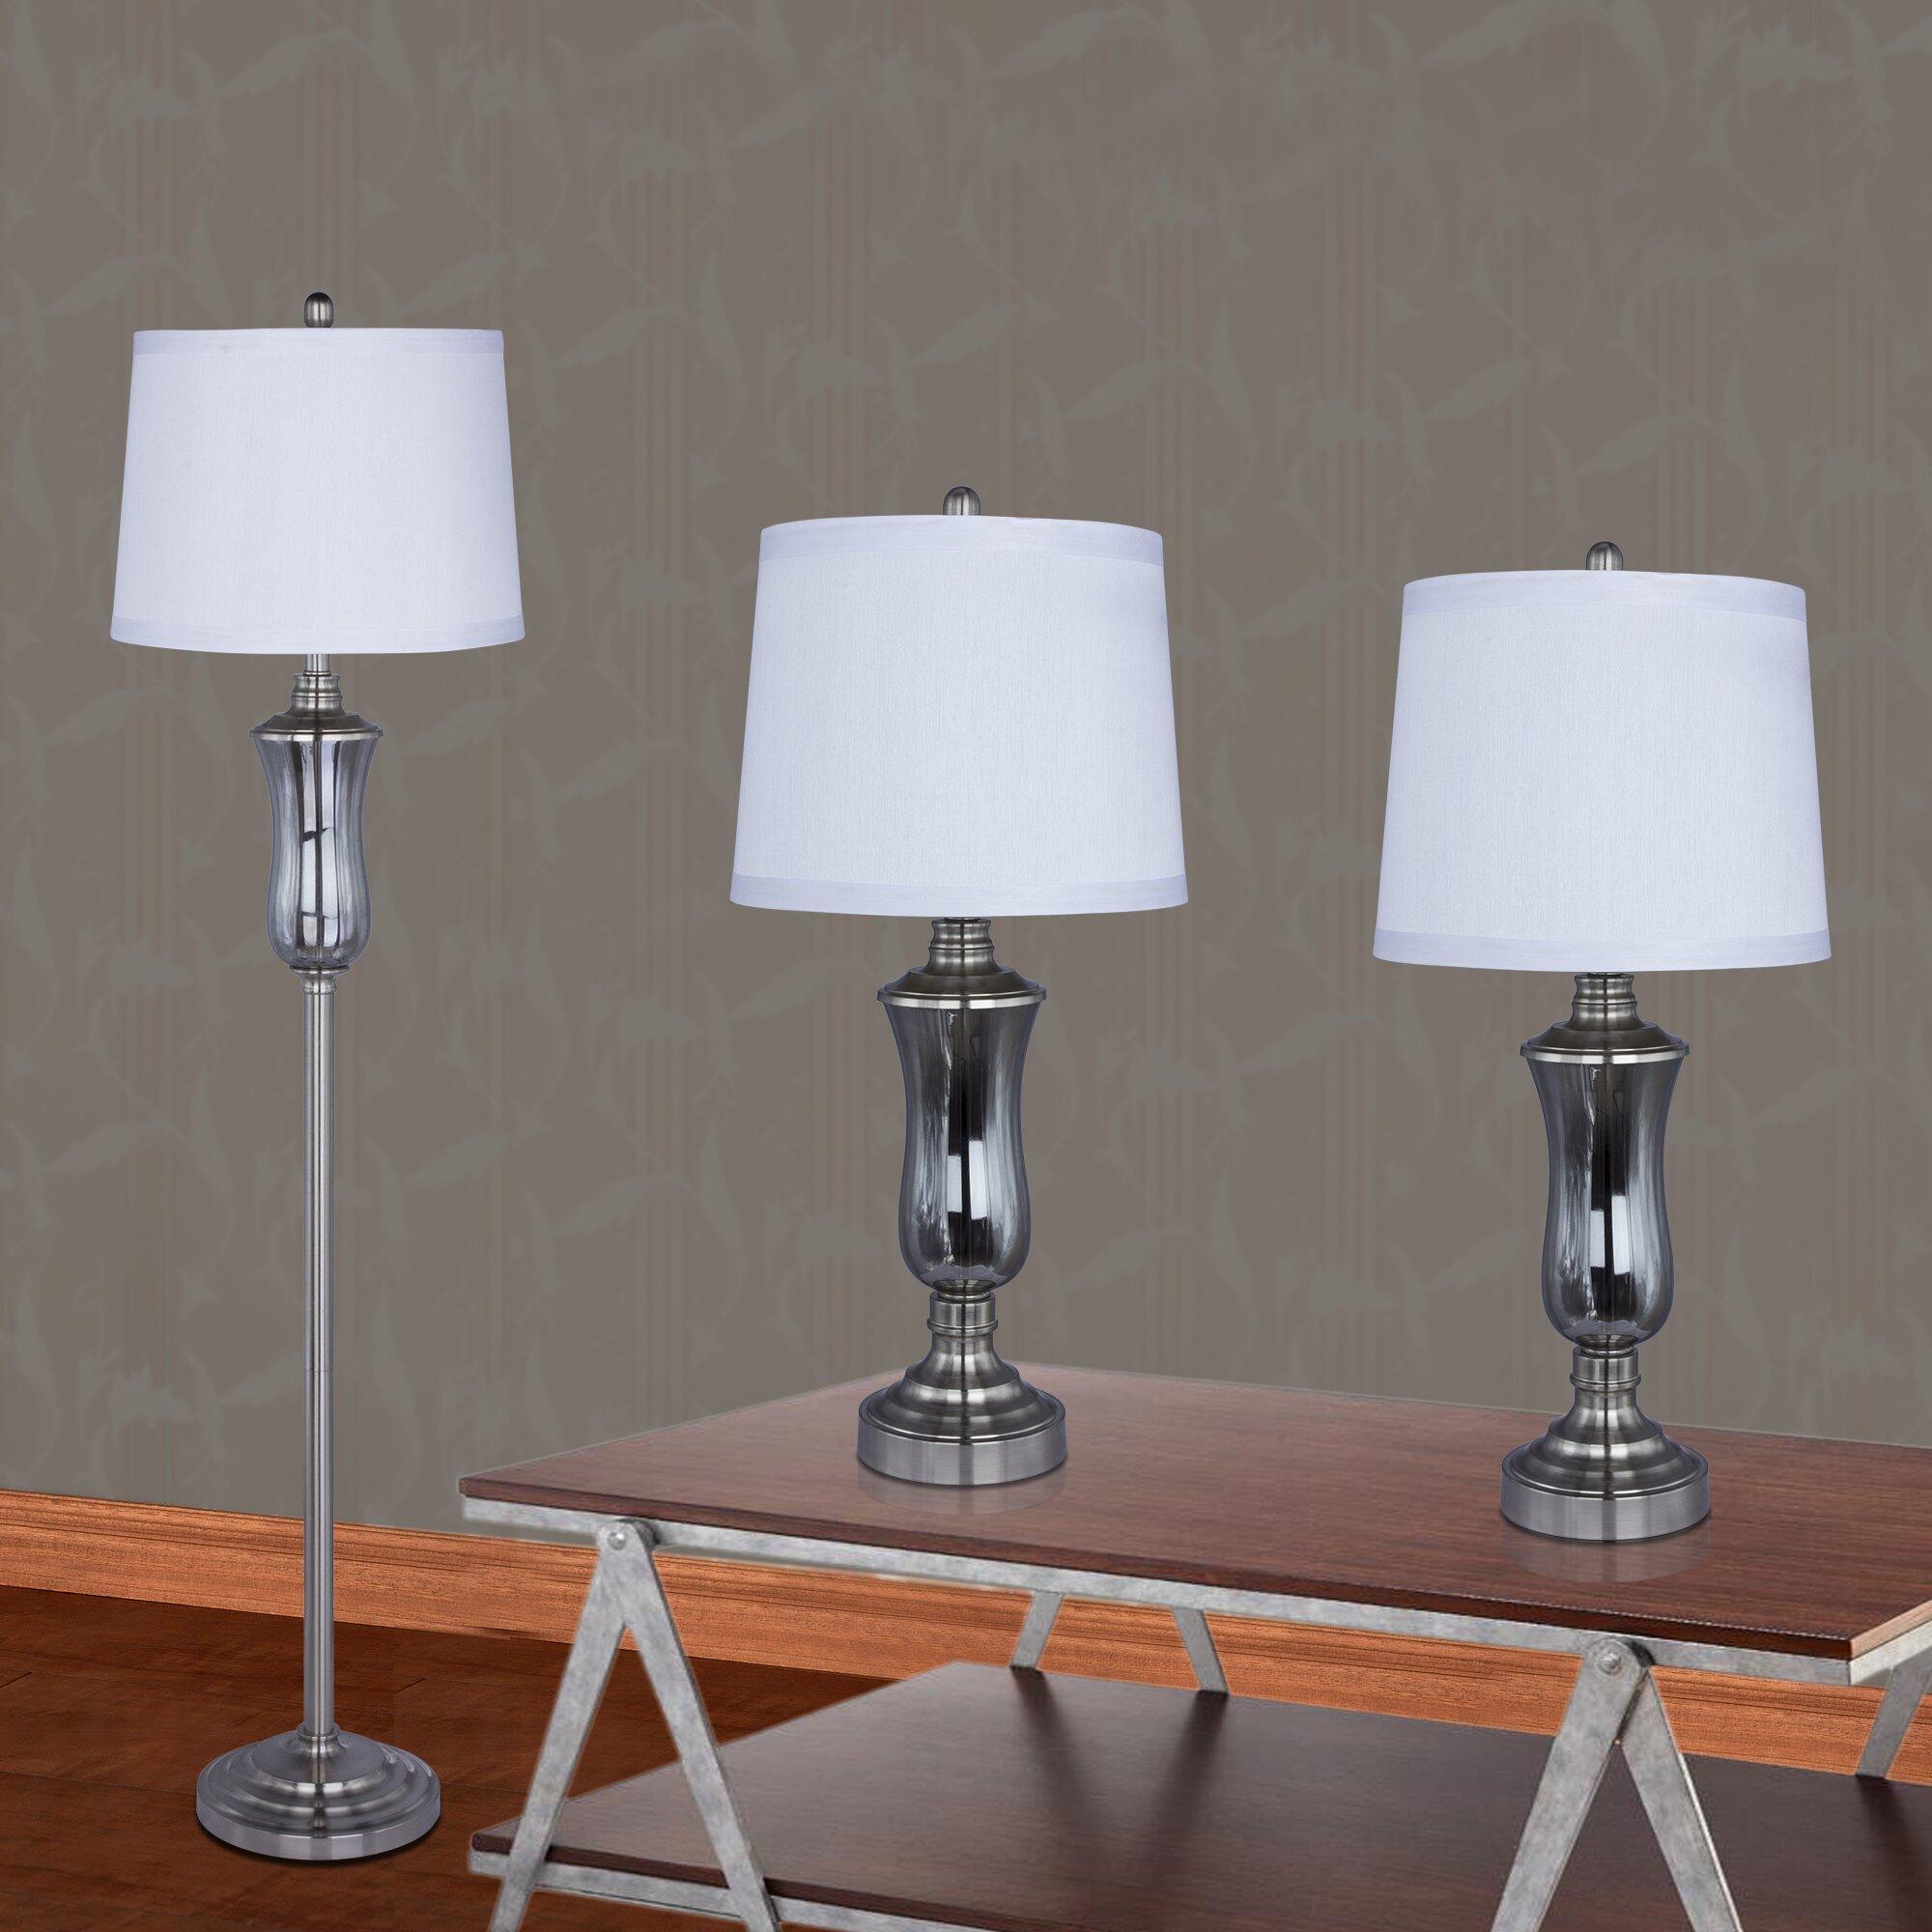 lighting lamps table lamps fangio sku fg2127. Black Bedroom Furniture Sets. Home Design Ideas